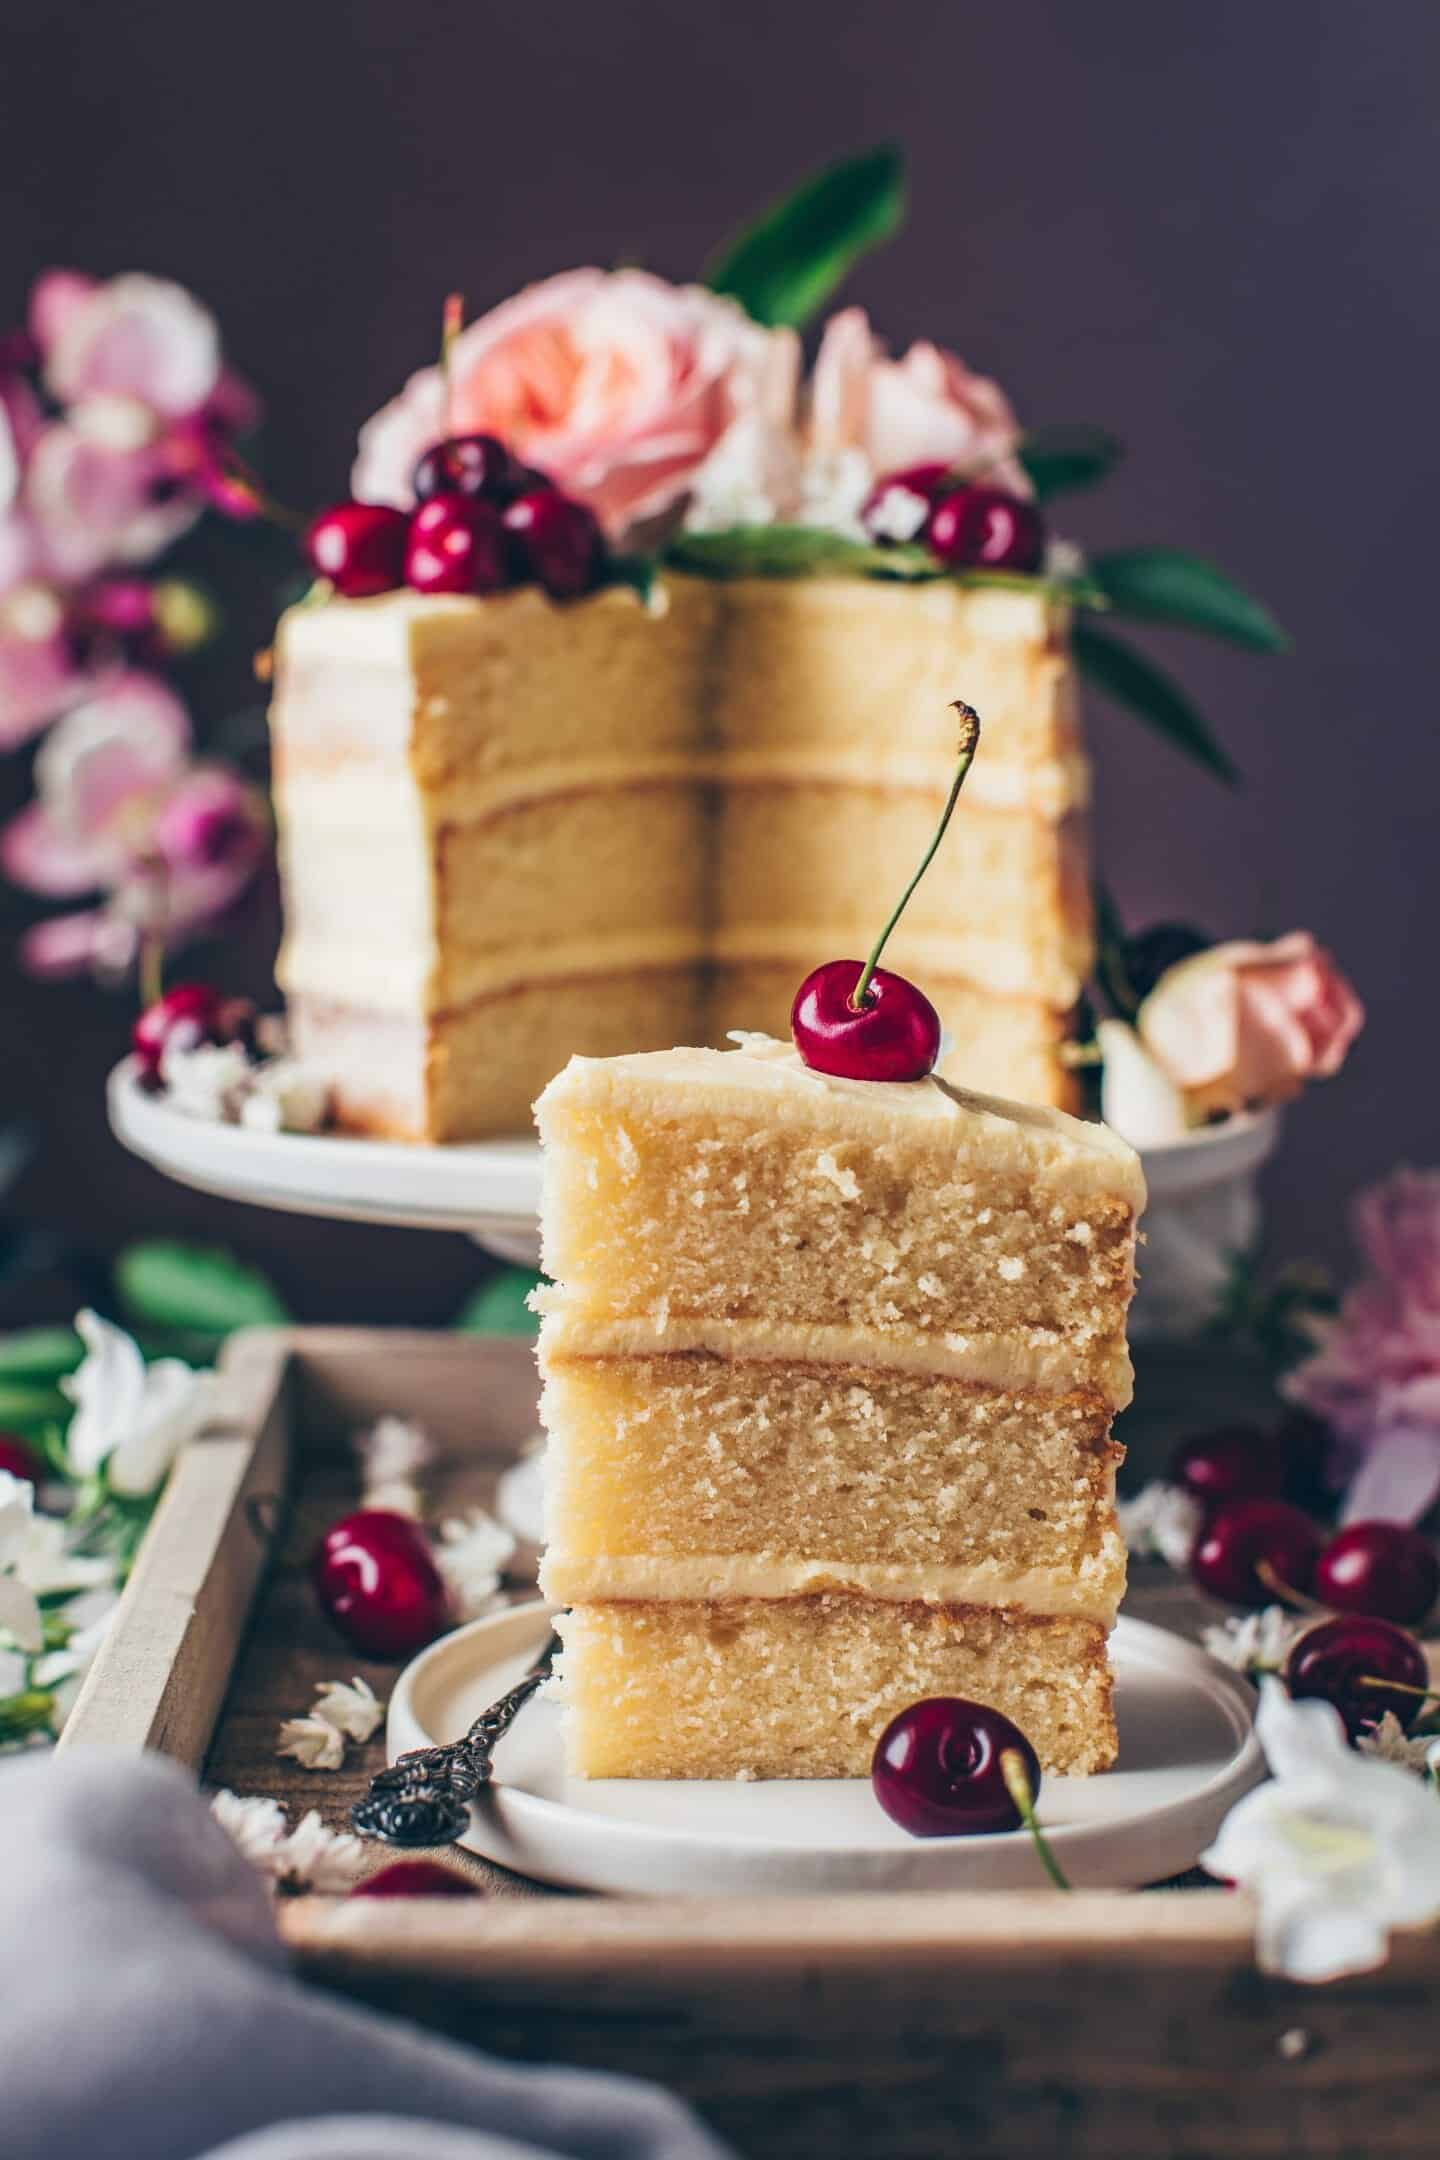 Vanille Creme Torte Vegan Bianca Zapatka Foodblog